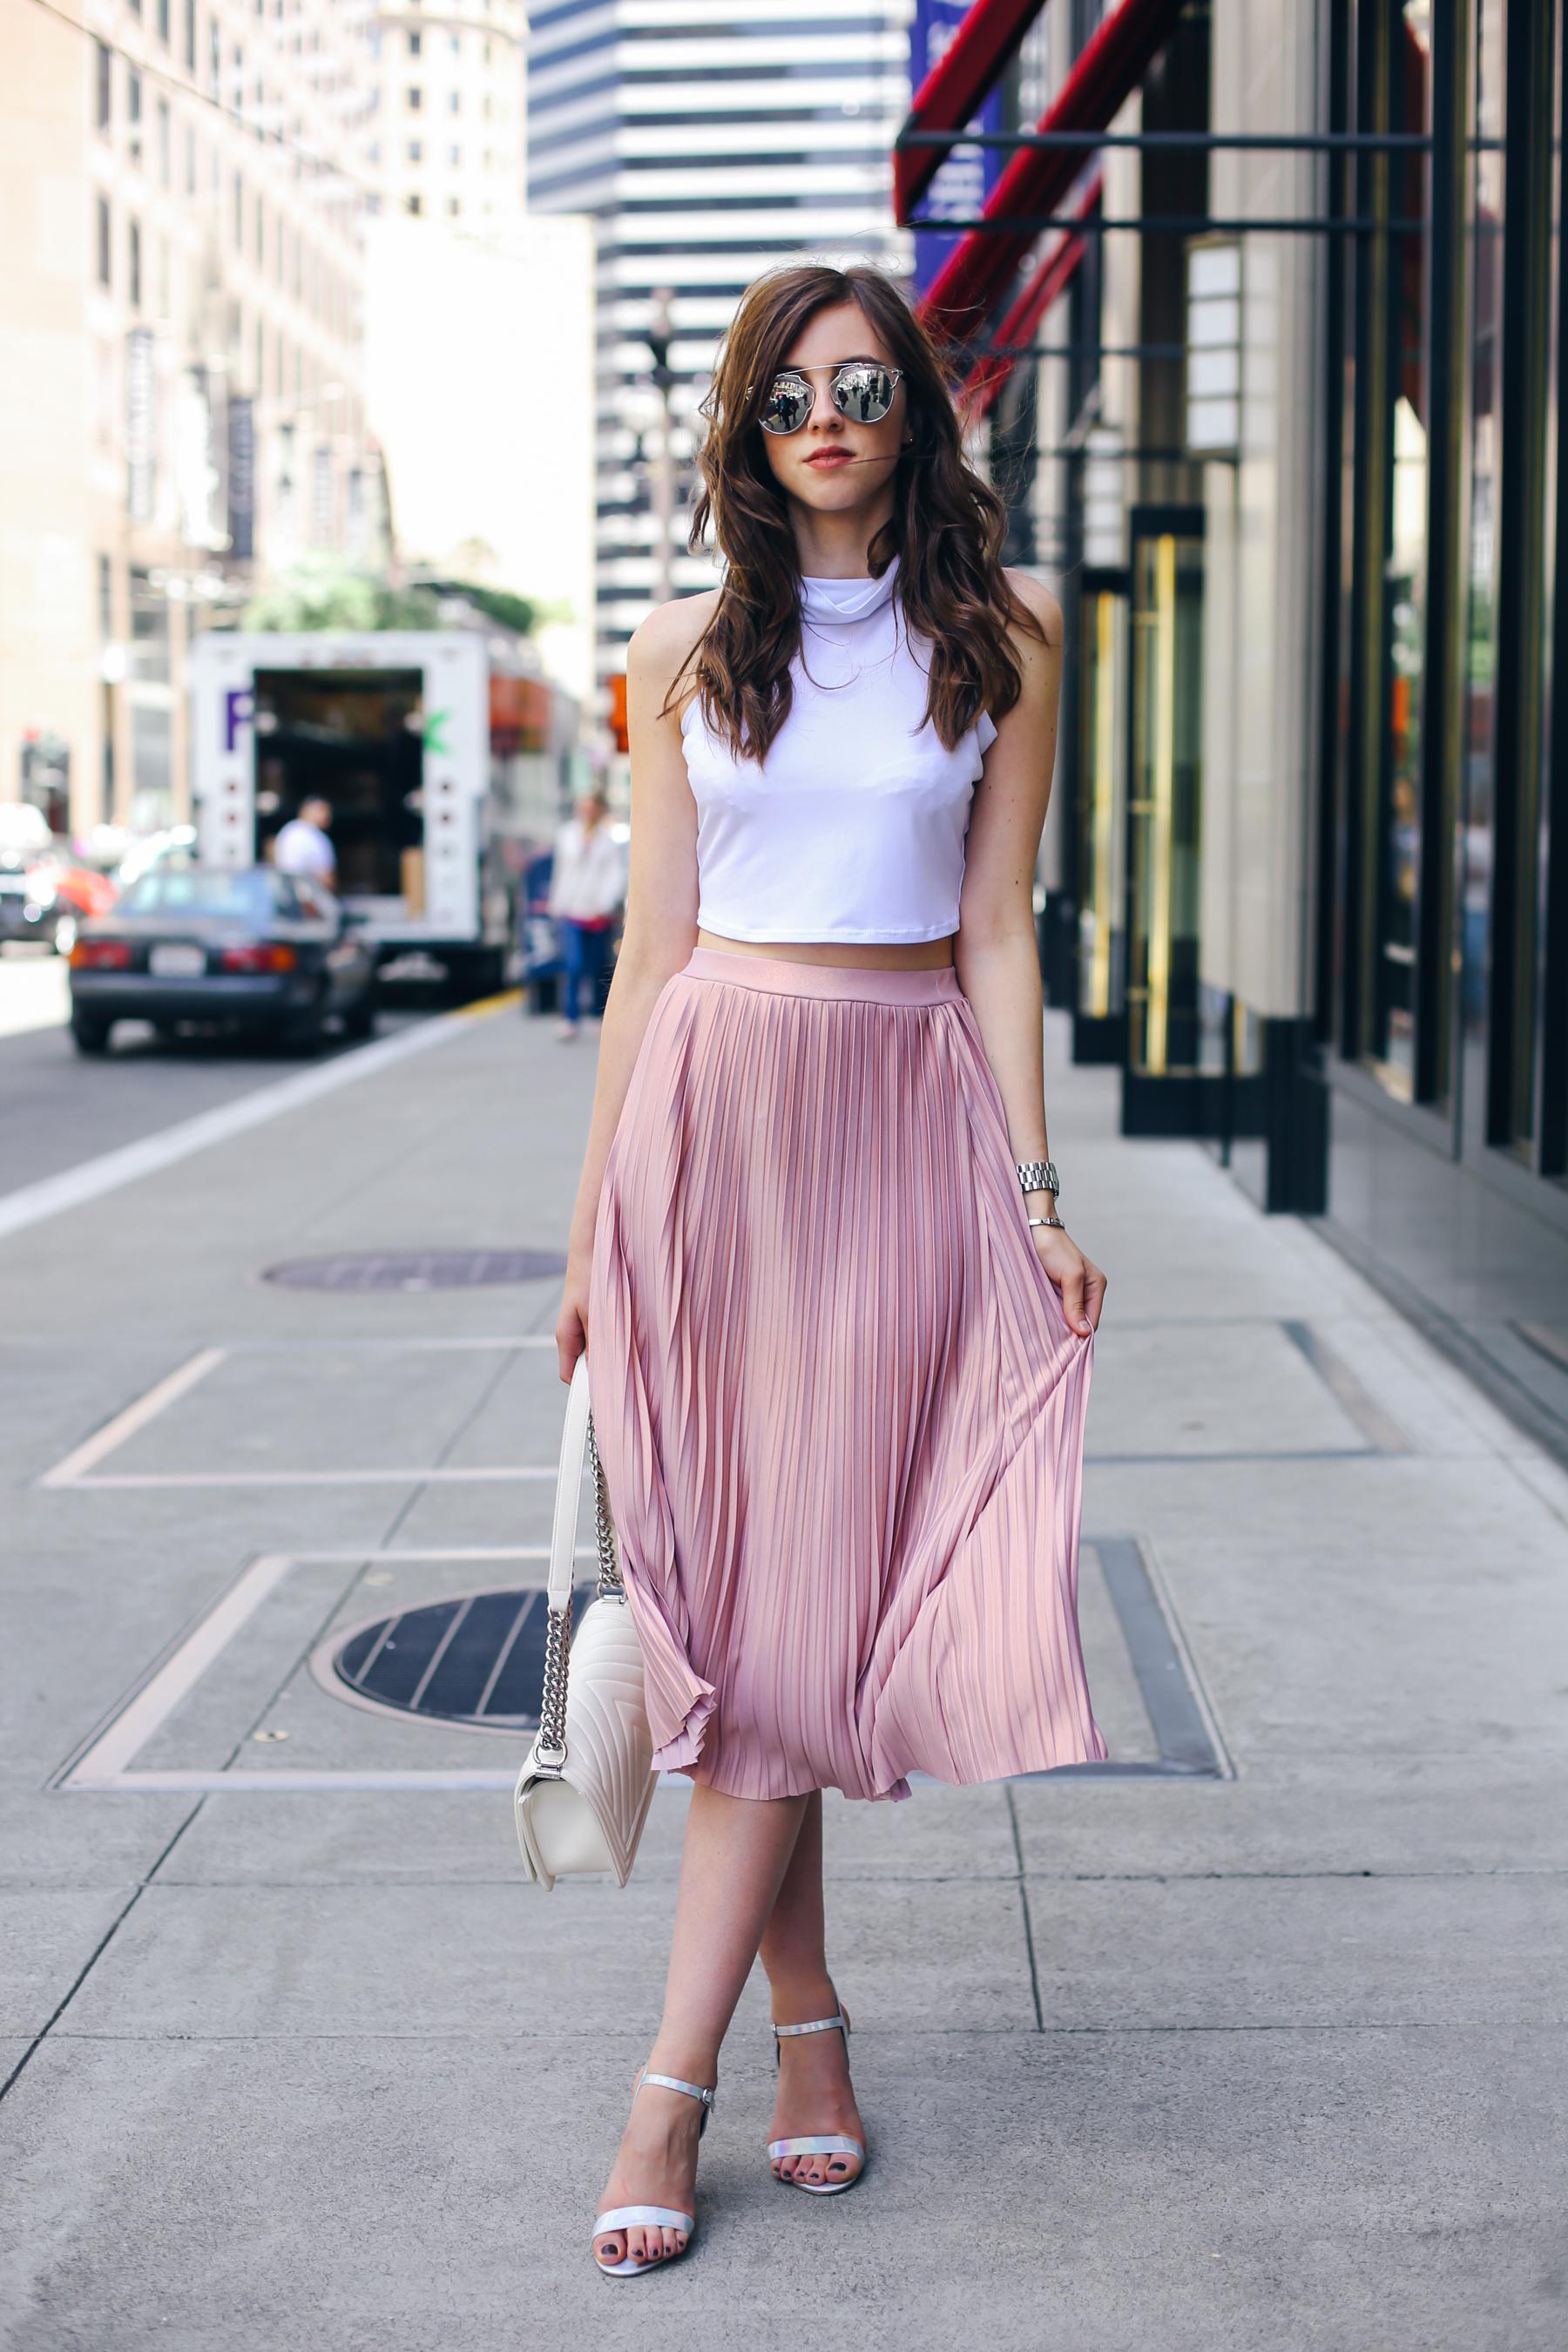 Barbora-Ondracova-FashioninmySoul-Fashion-Blogger-Photography-RyanbyRyanChua-7466